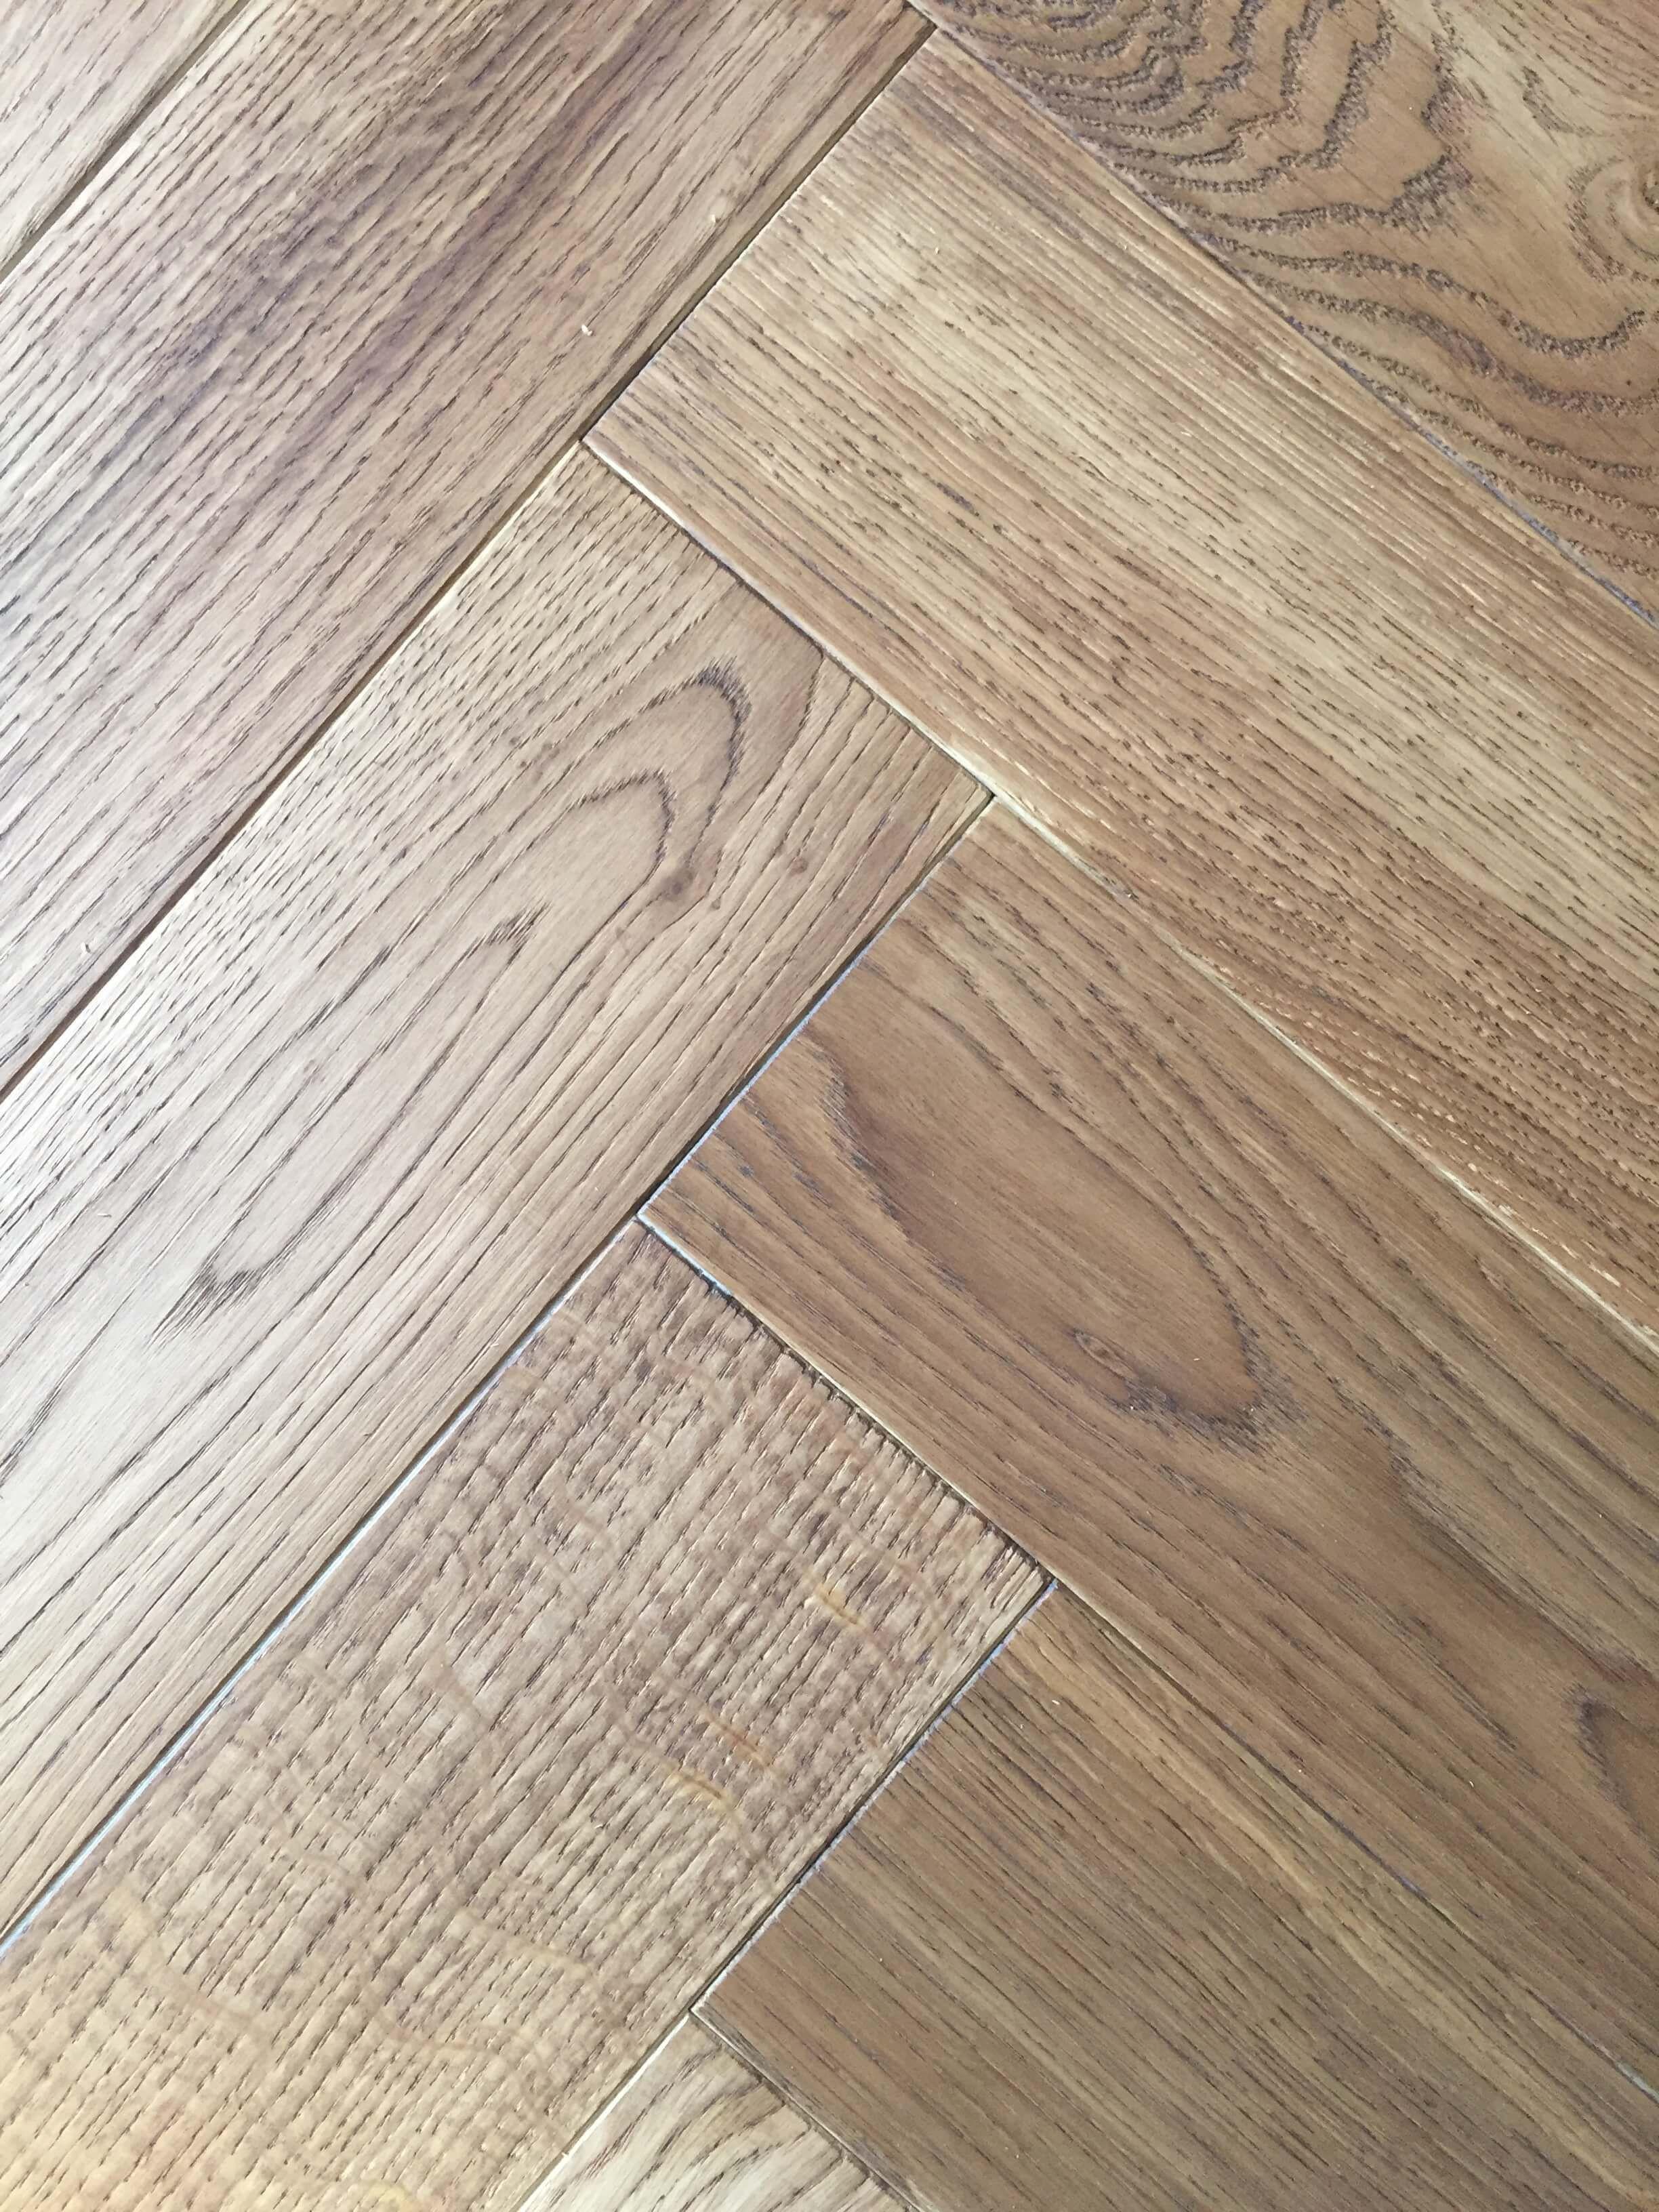 hardwood flooring cost per square metre of wooden flooring price 4305 laminate flooring cost 50 luxury vinyl for cost uk wooden flooring price laminate flooring square foot price inspiration where to buy